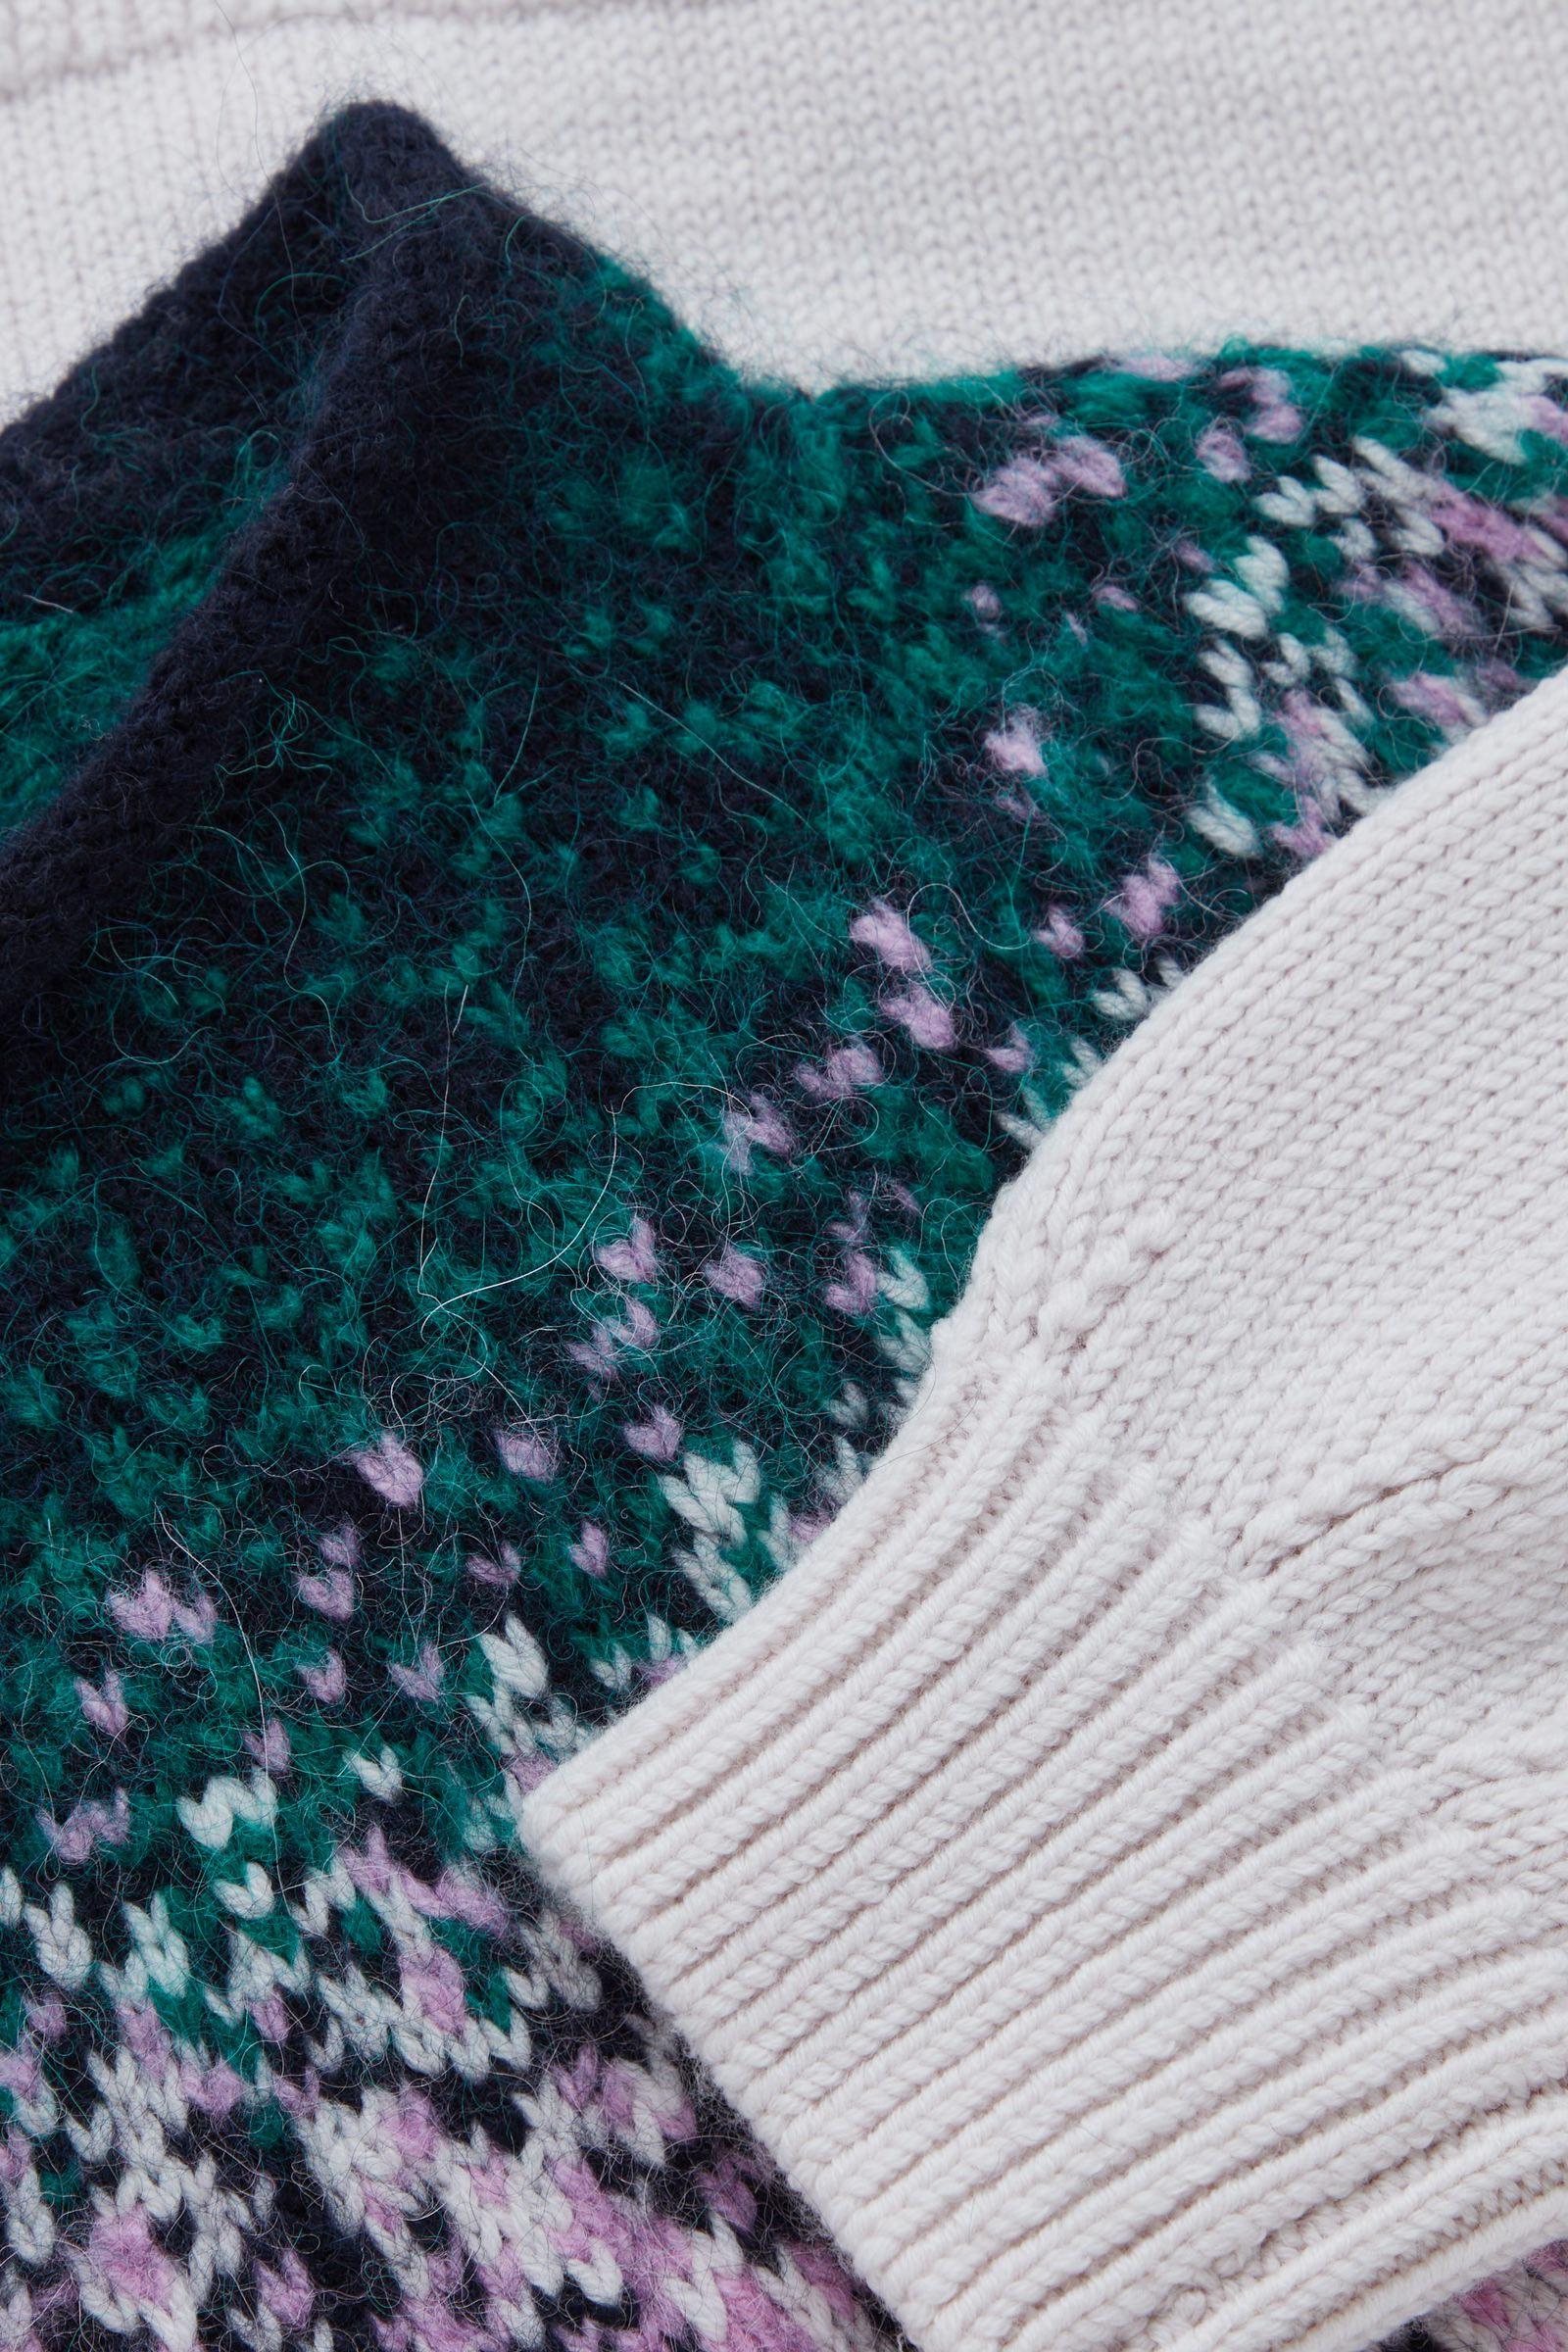 COS 리사이클 울 믹스 페어 아일 니트 스웨터의 멀티컬러컬러 Detail입니다.